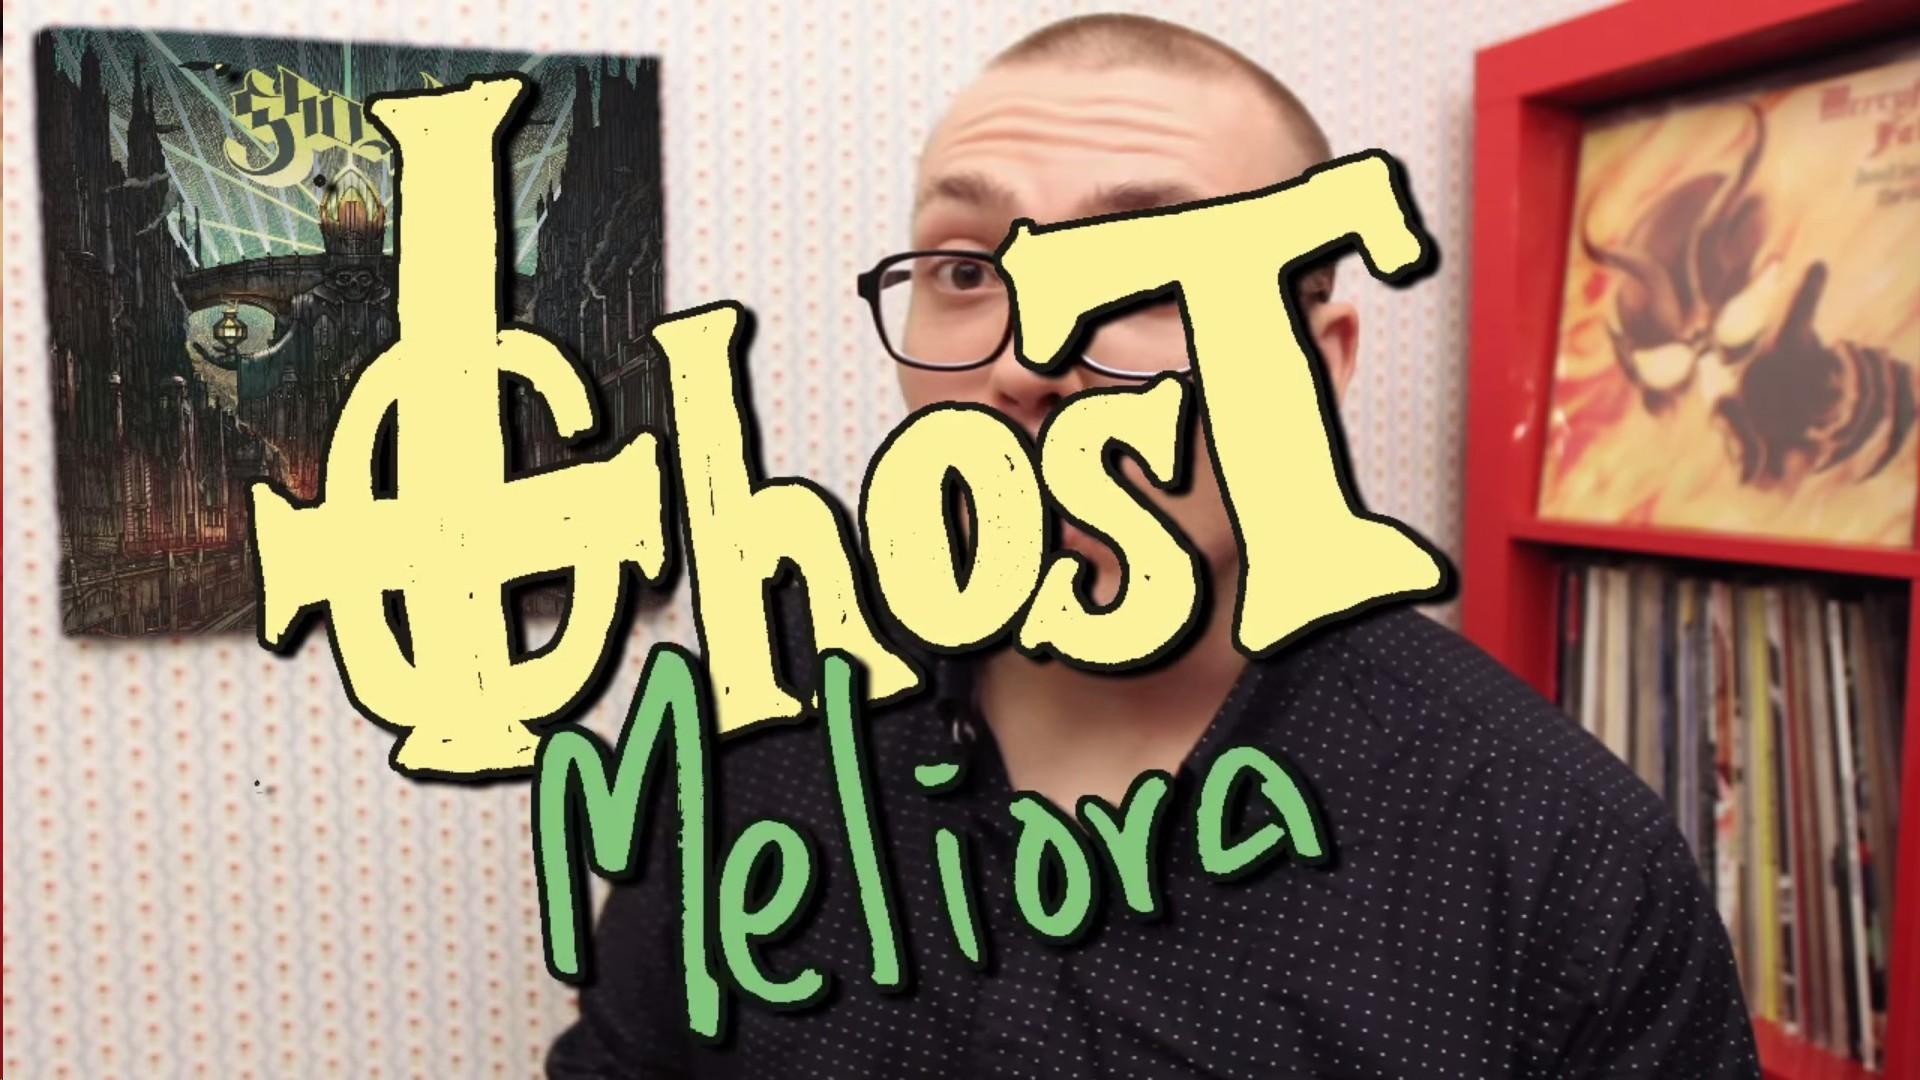 Theneedledrop.com (Anthony Fantano) Reviews Meliora